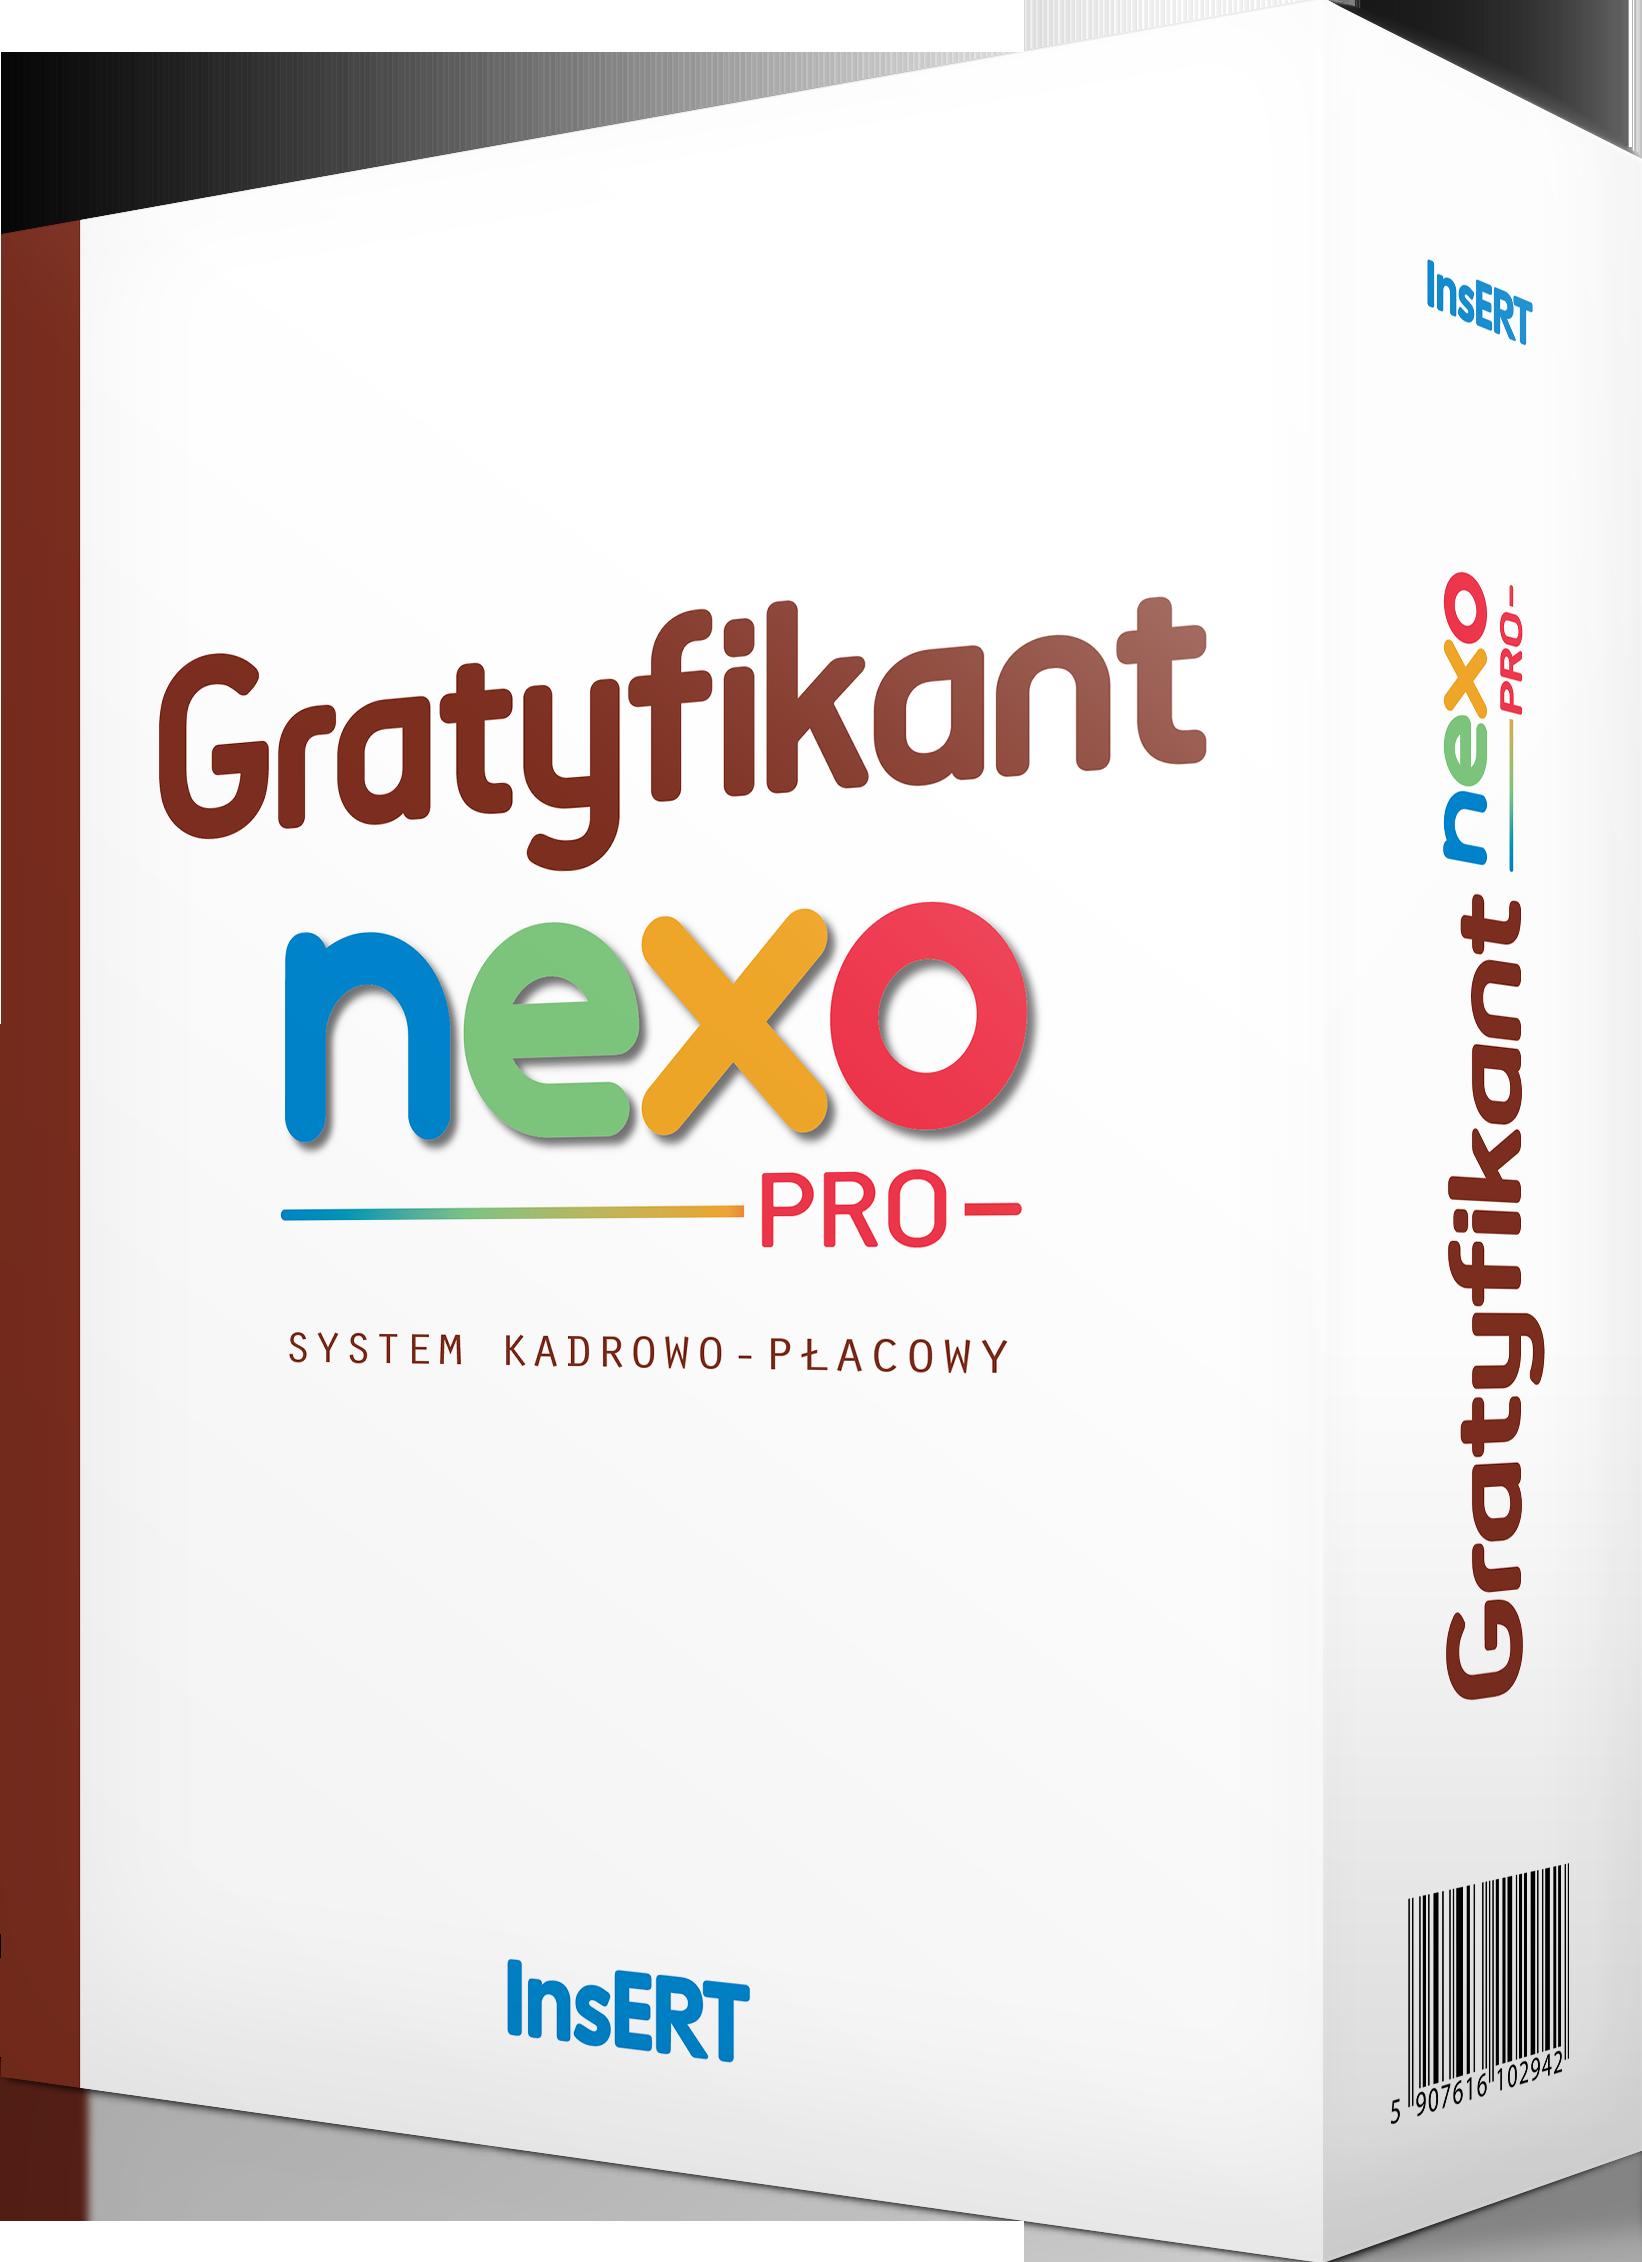 Gratyfikant_nexo_PRO_pudelko.png